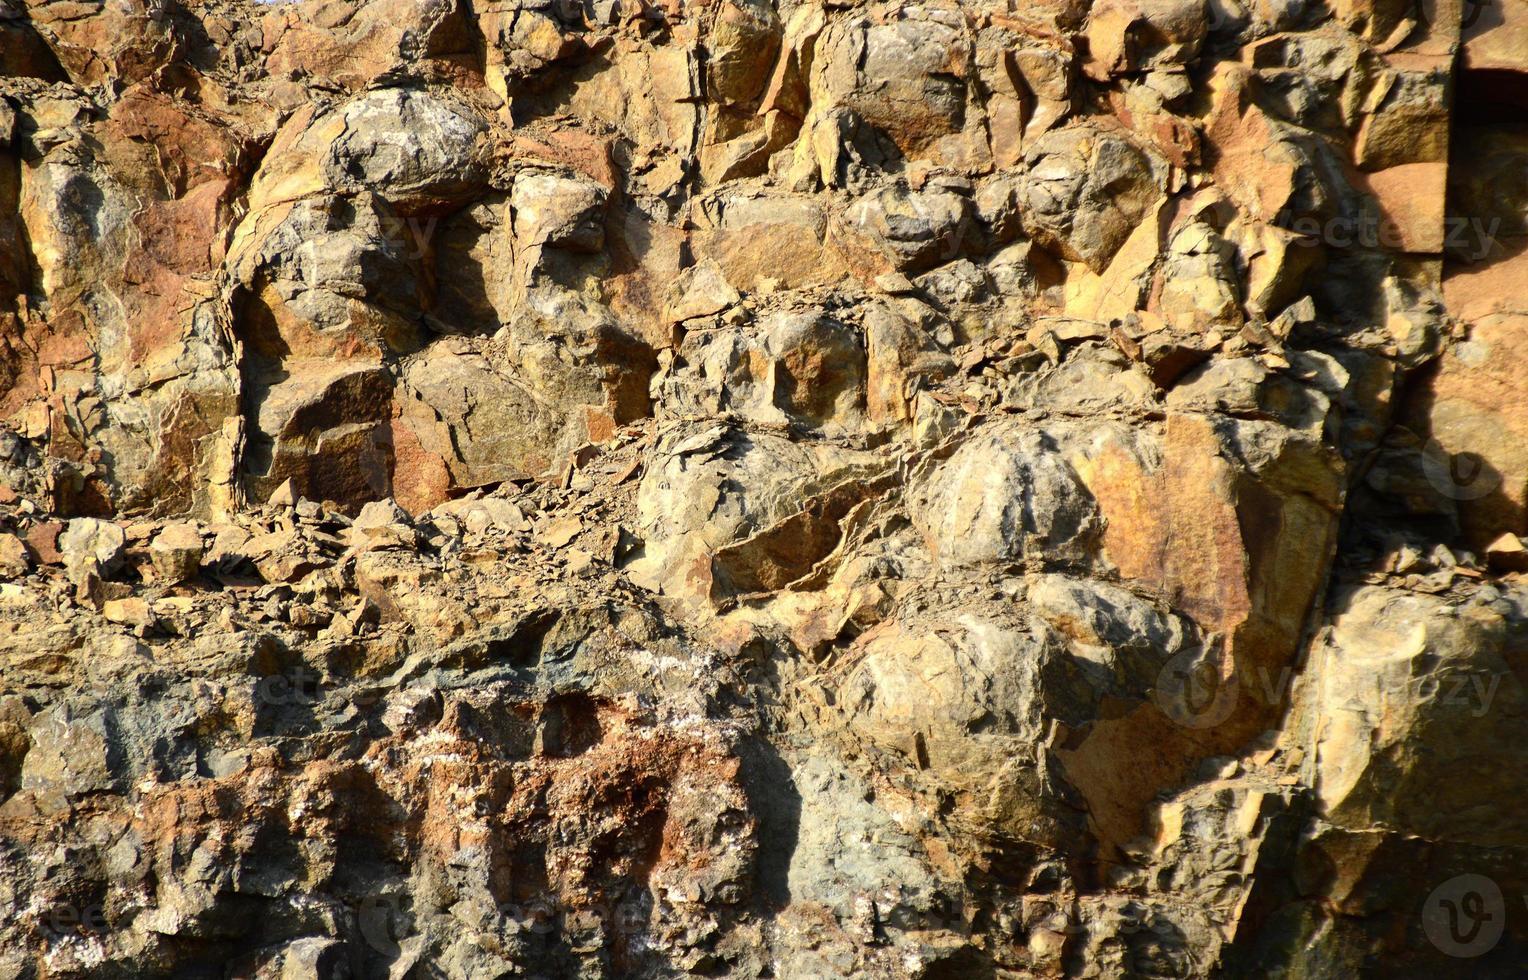 Seamless stone texture. Close-up of Stone photo